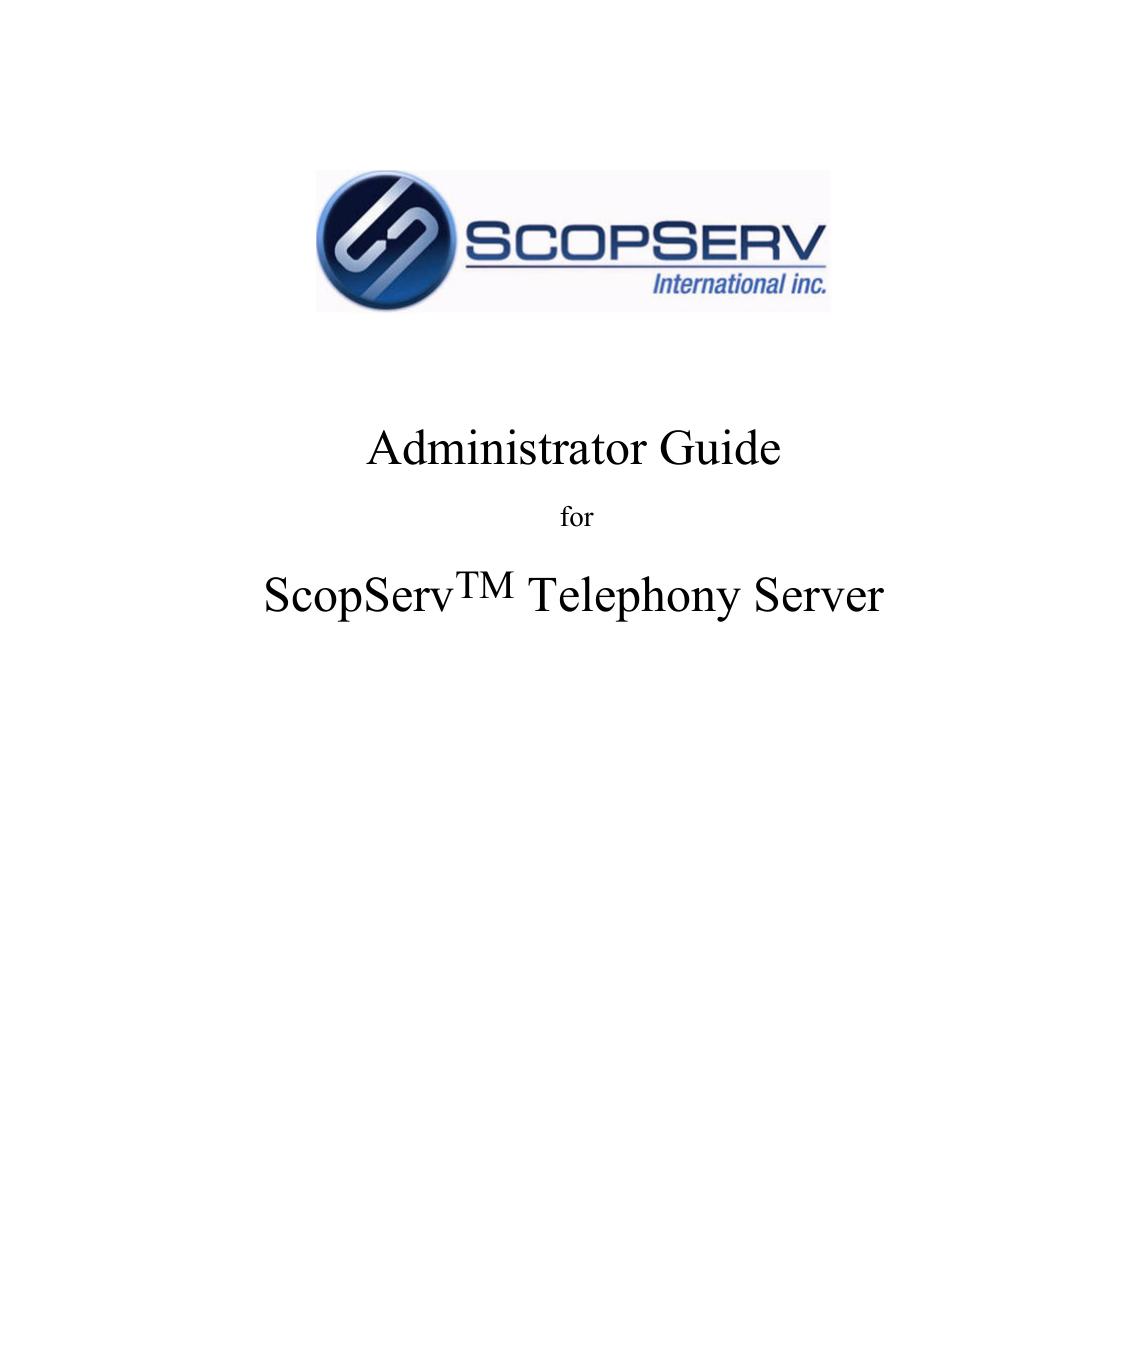 ScopServ Administrator Guide - ScopServ International Inc